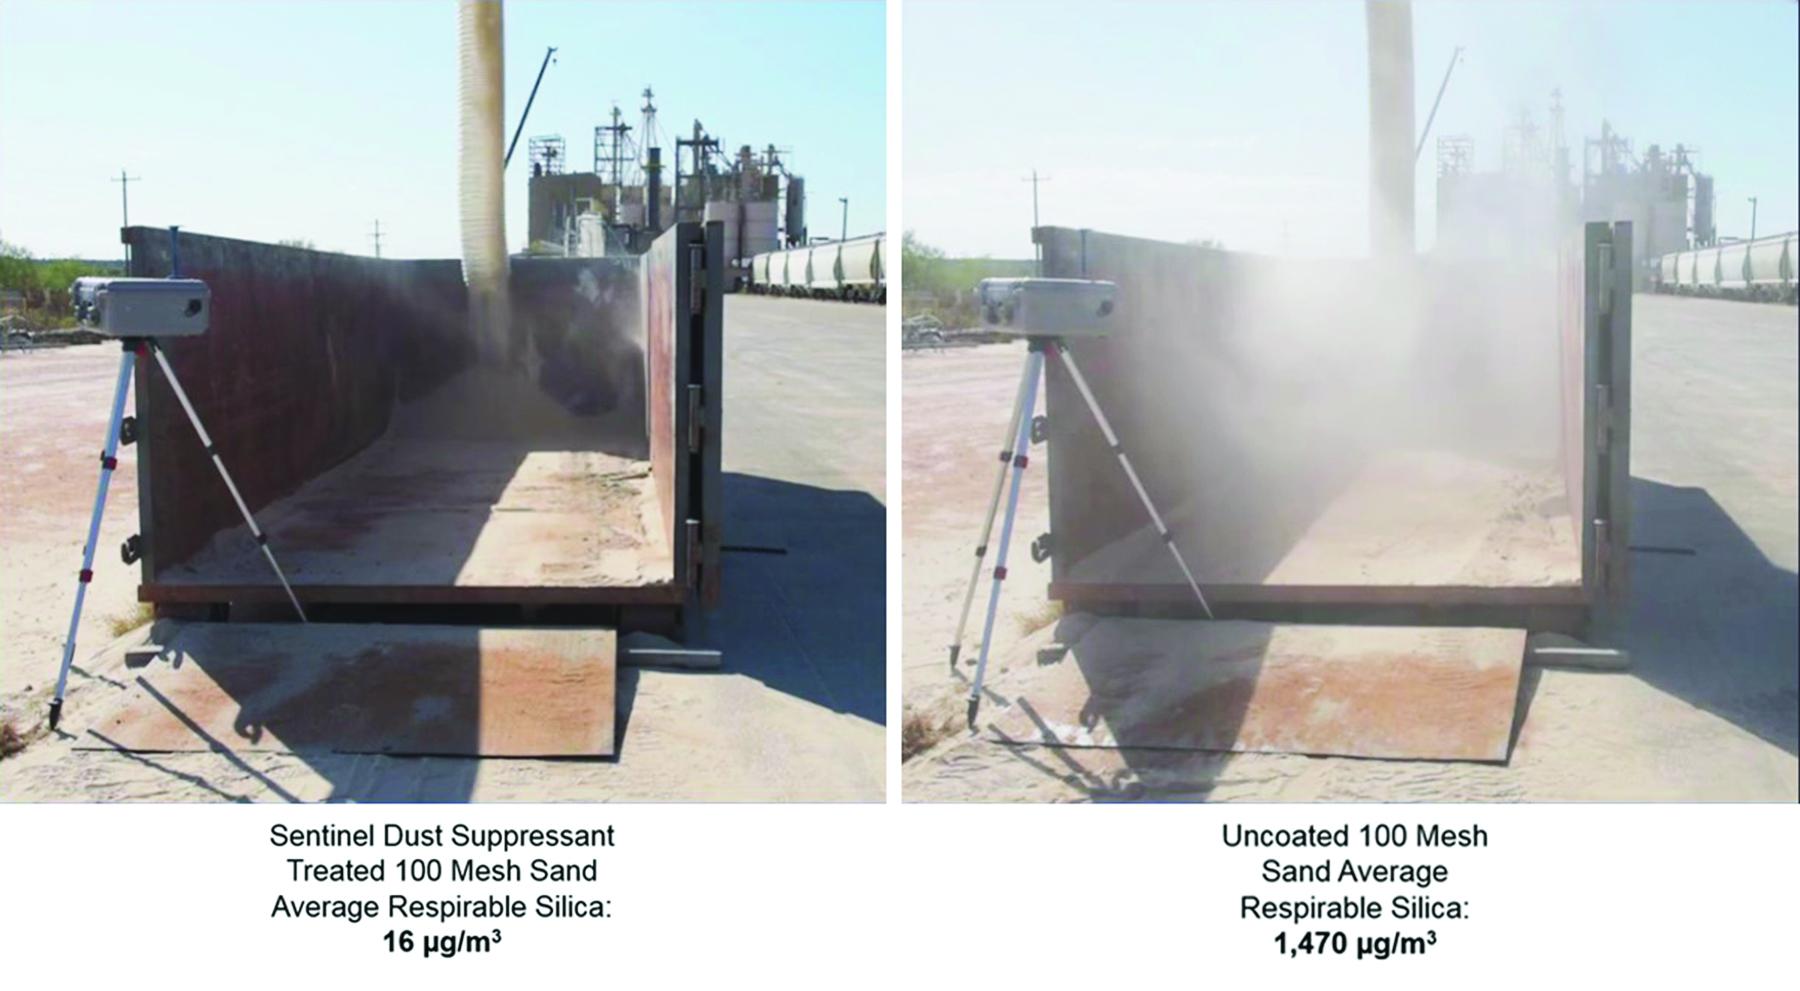 Bustin' Dust: Integrated System Enables New OSHA Regulation